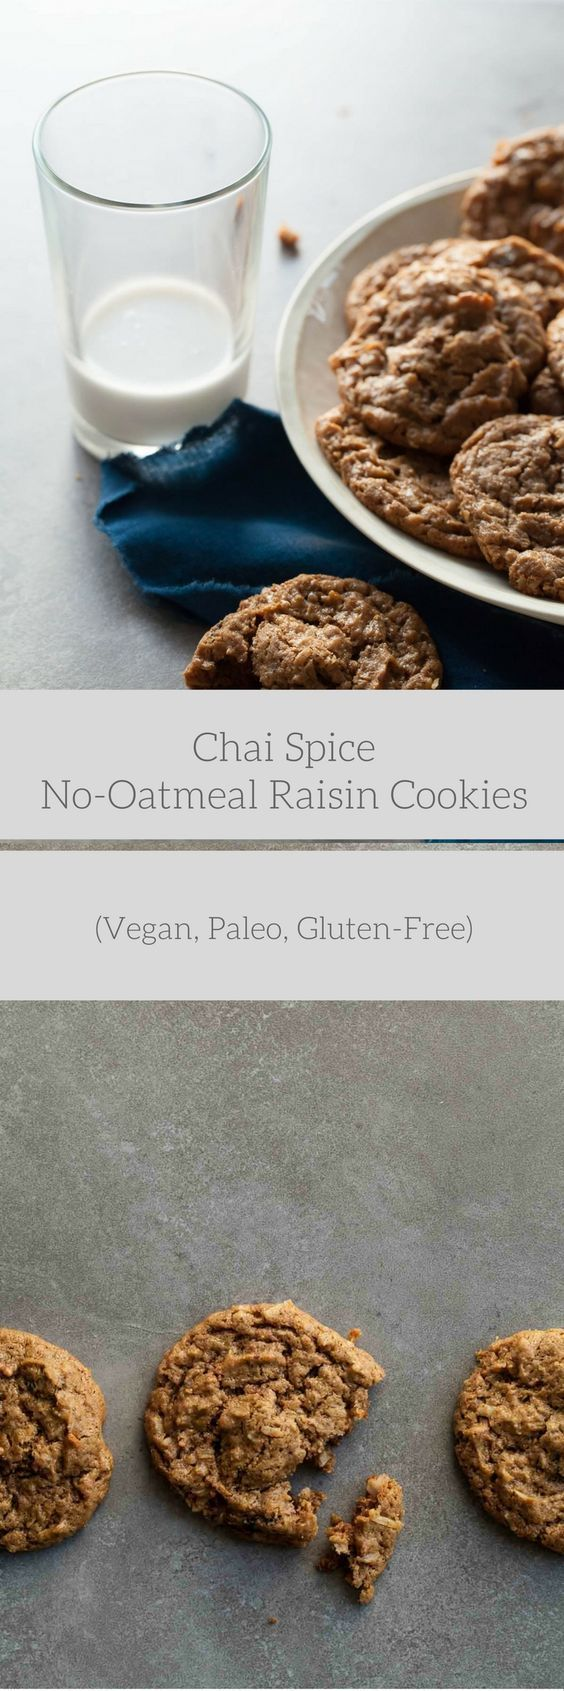 Chai Spice No Oatmeal Raisin Cookies Vegan Paleo Recipe Raisin Cookies Oatmeal Raisin Vegan Cookies